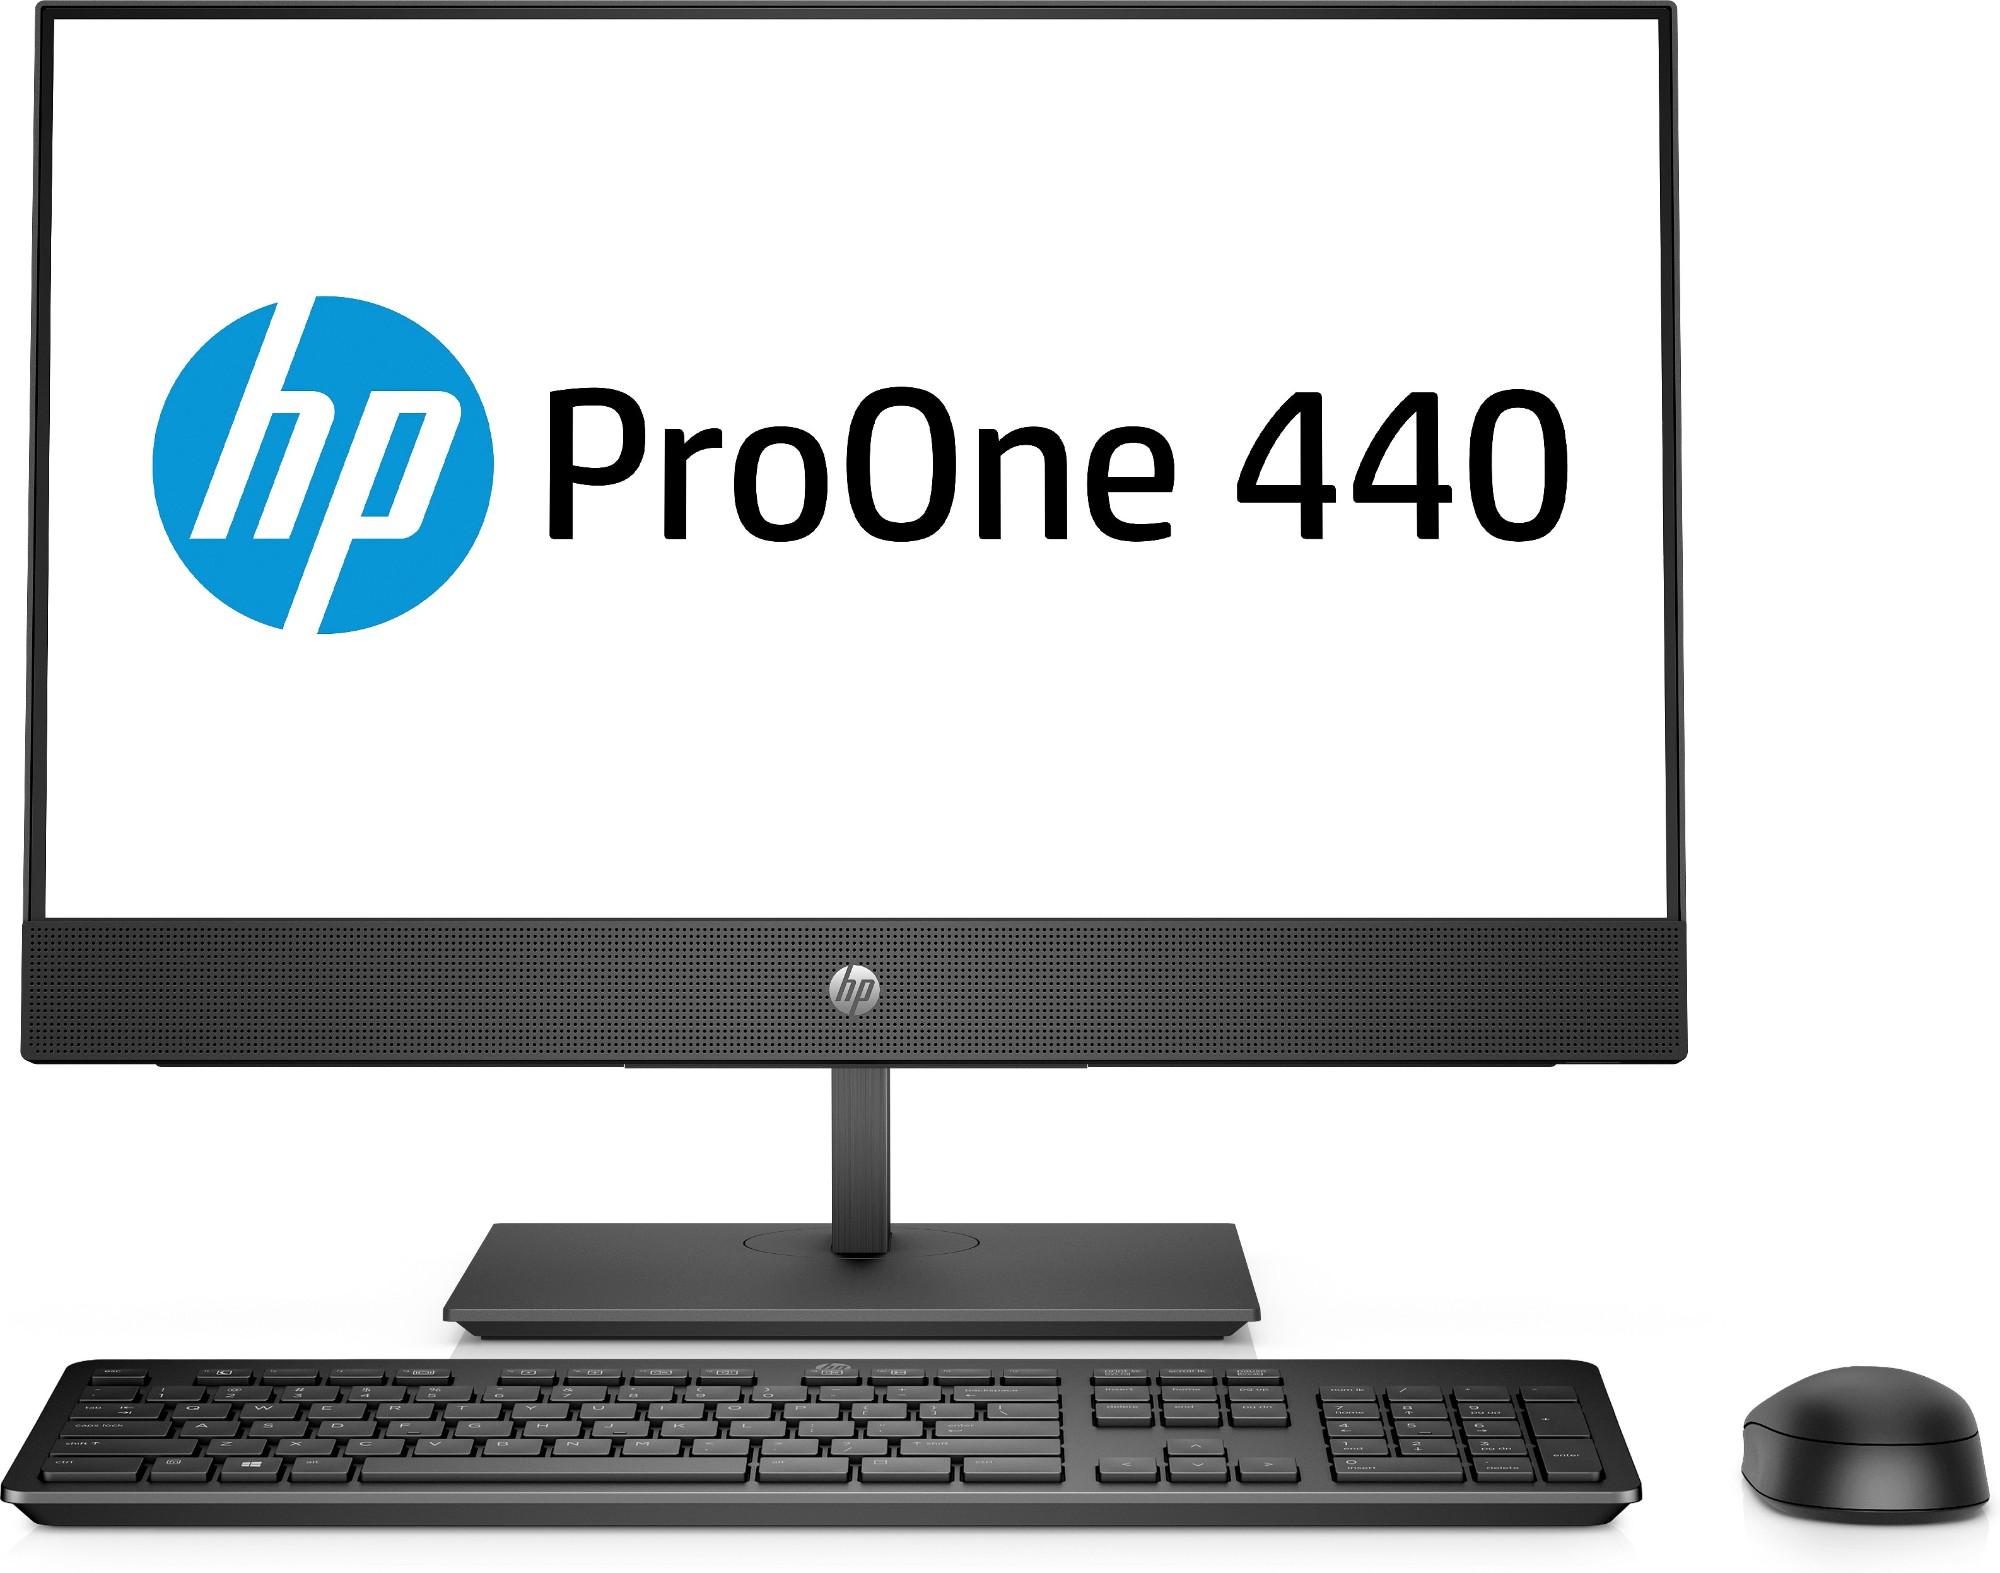 HP AIO ProOne 440 G4 4NT88EA#ABU Core i5-8500T 4GB 500GB DVDRW 23.8IN FHD Win 10 Pro